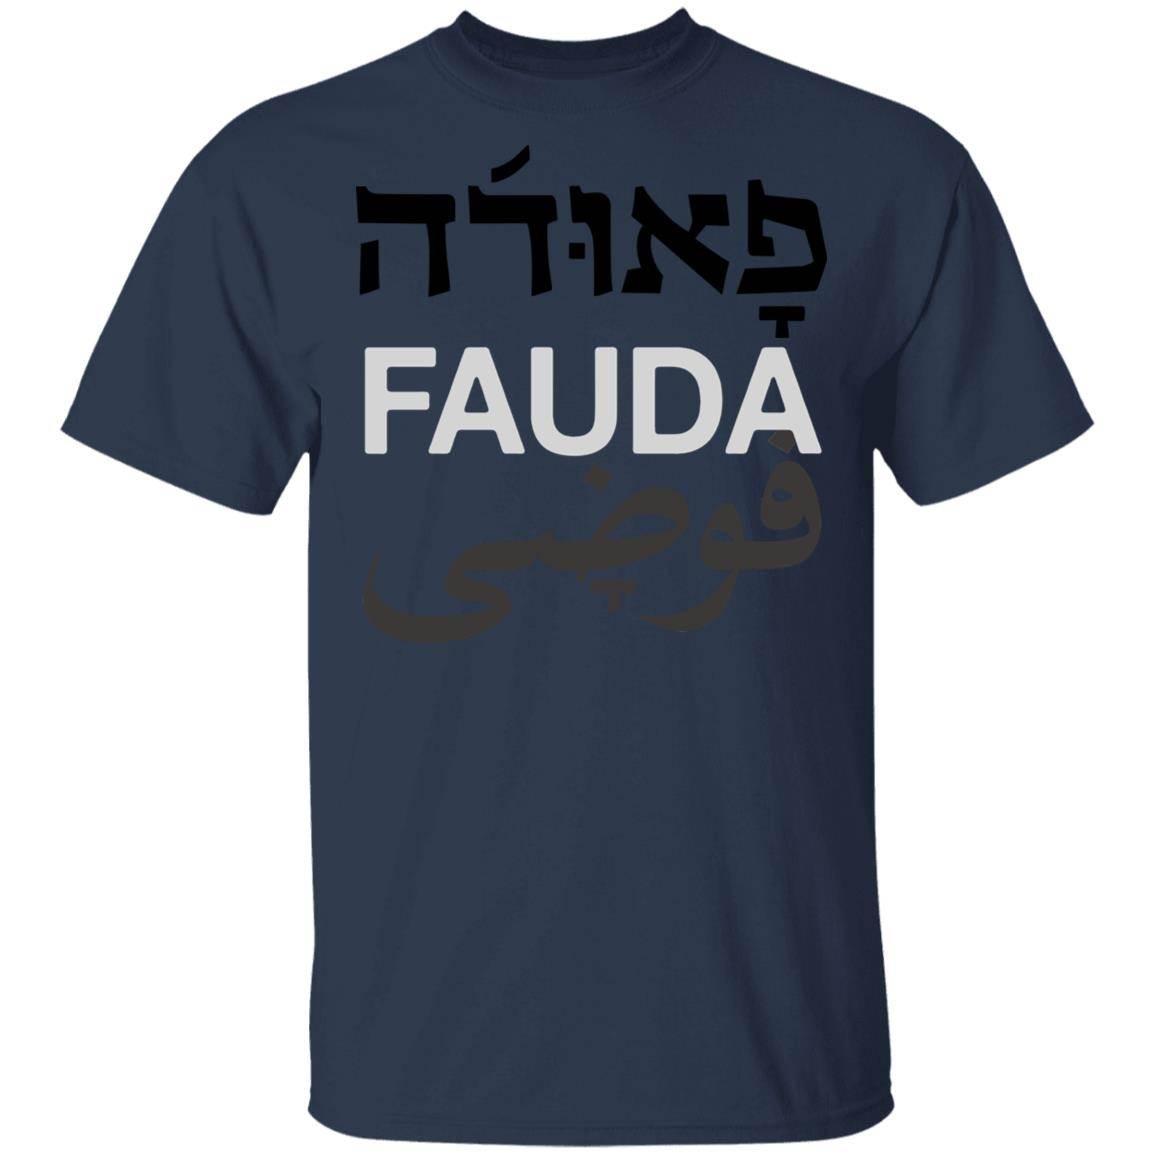 Fauda T-Shirt – From the hit TV Shirt